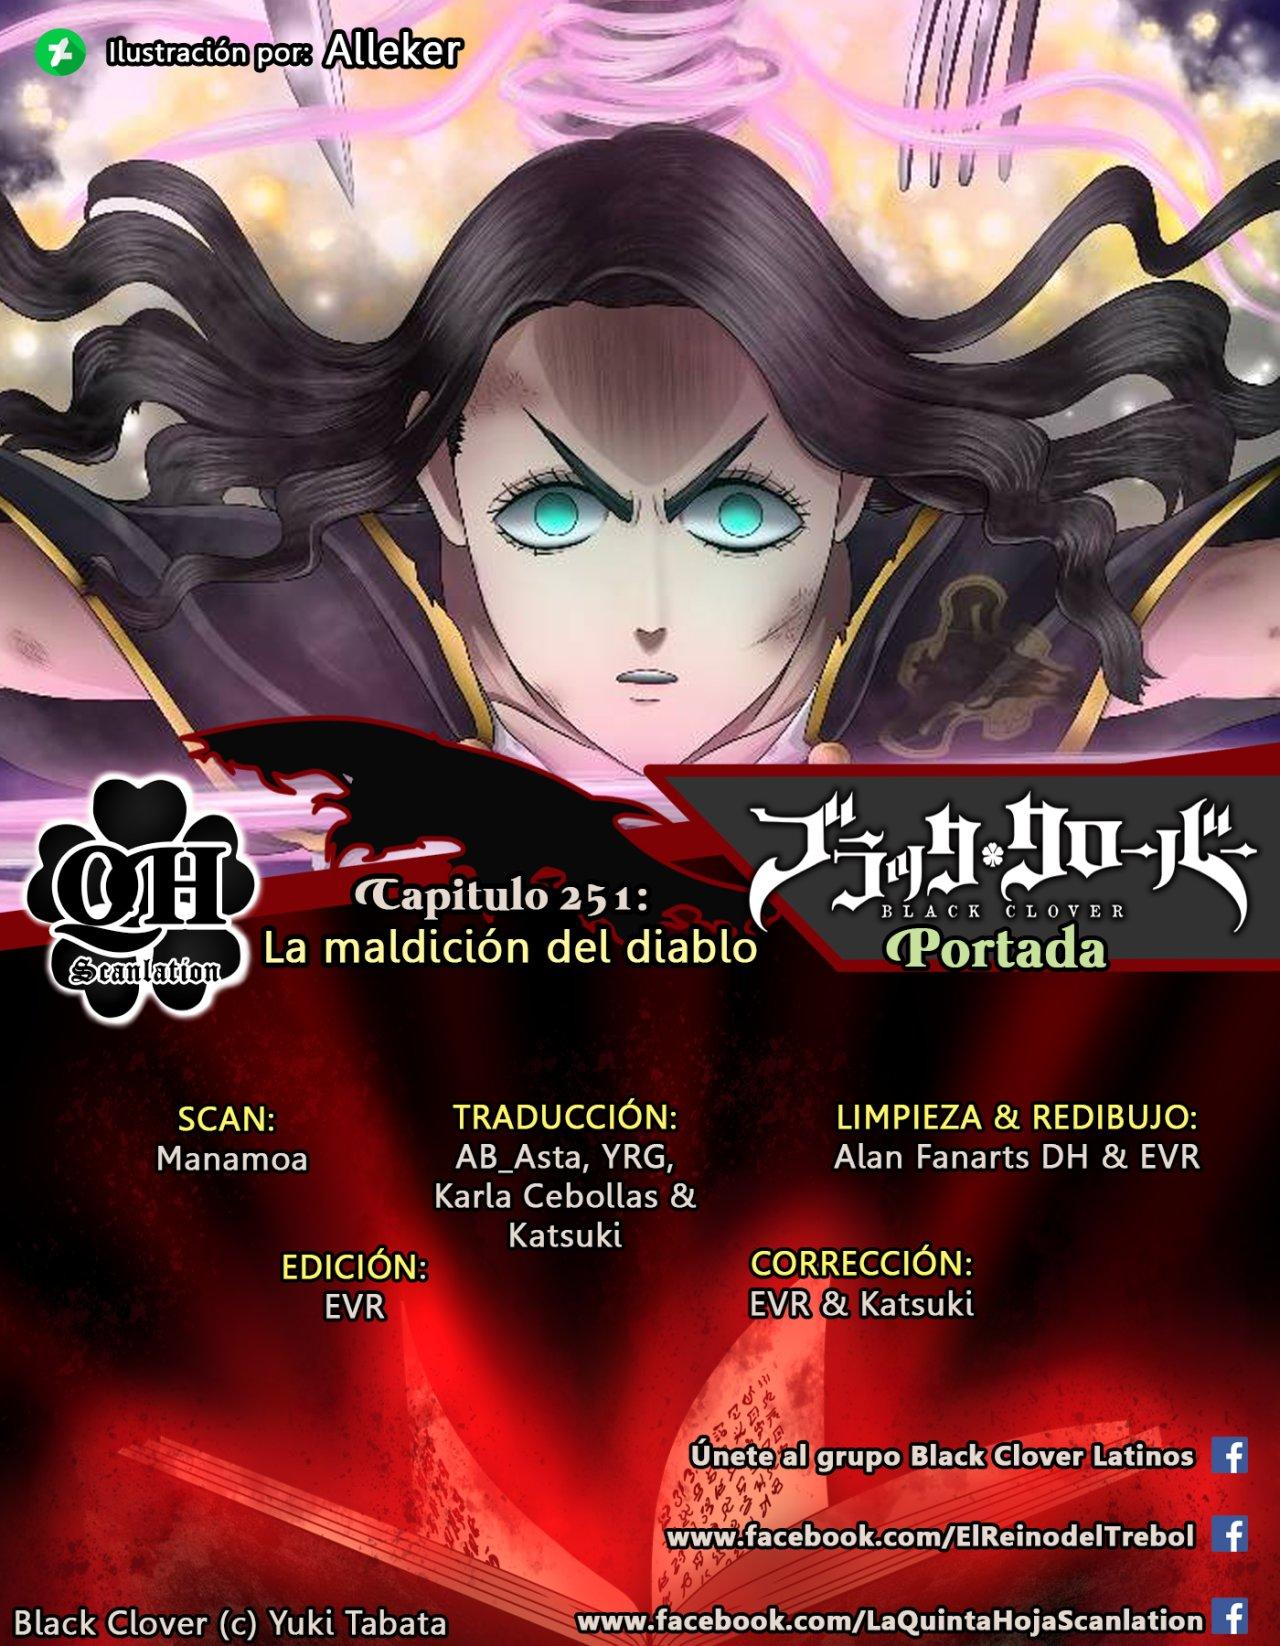 https://nine.mangadogs.com/es_manga/pic8/35/3811/946812/36fd99f222a8cc2a79d1606bdf6bd749.jpg Page 1